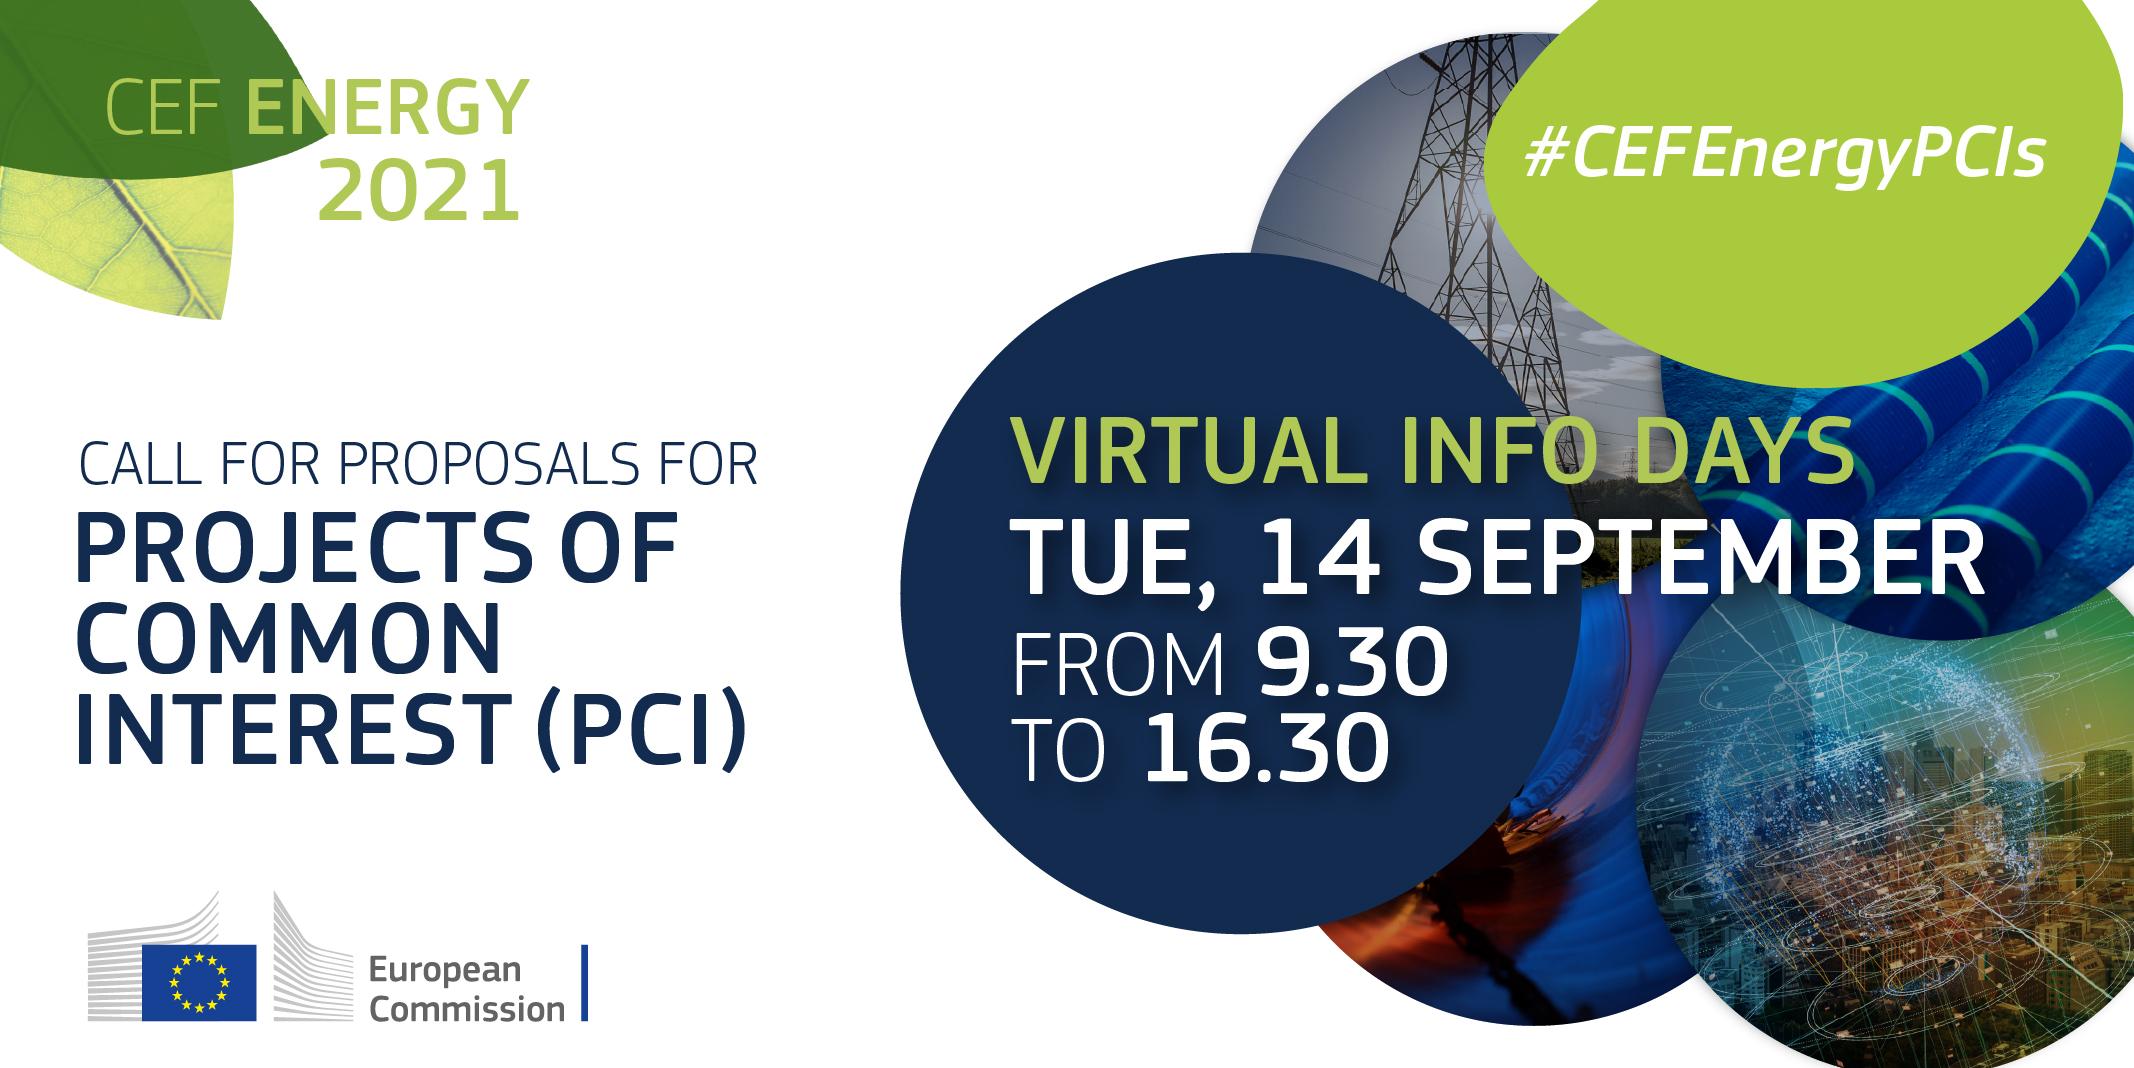 2021 CEF Energy Virtual Info Days